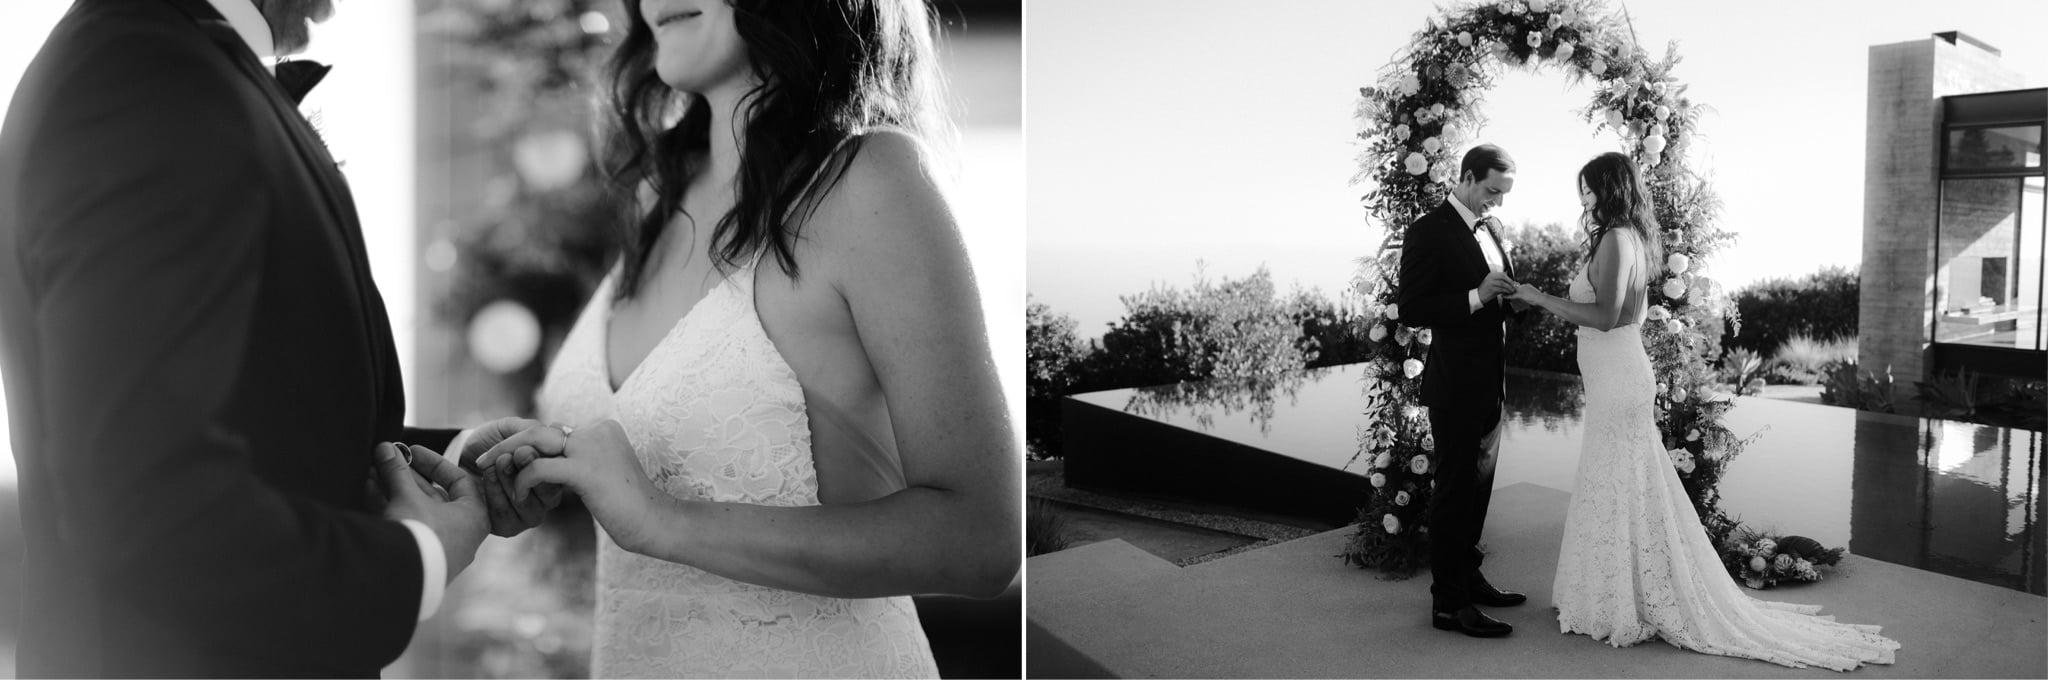 malibu wedding 062